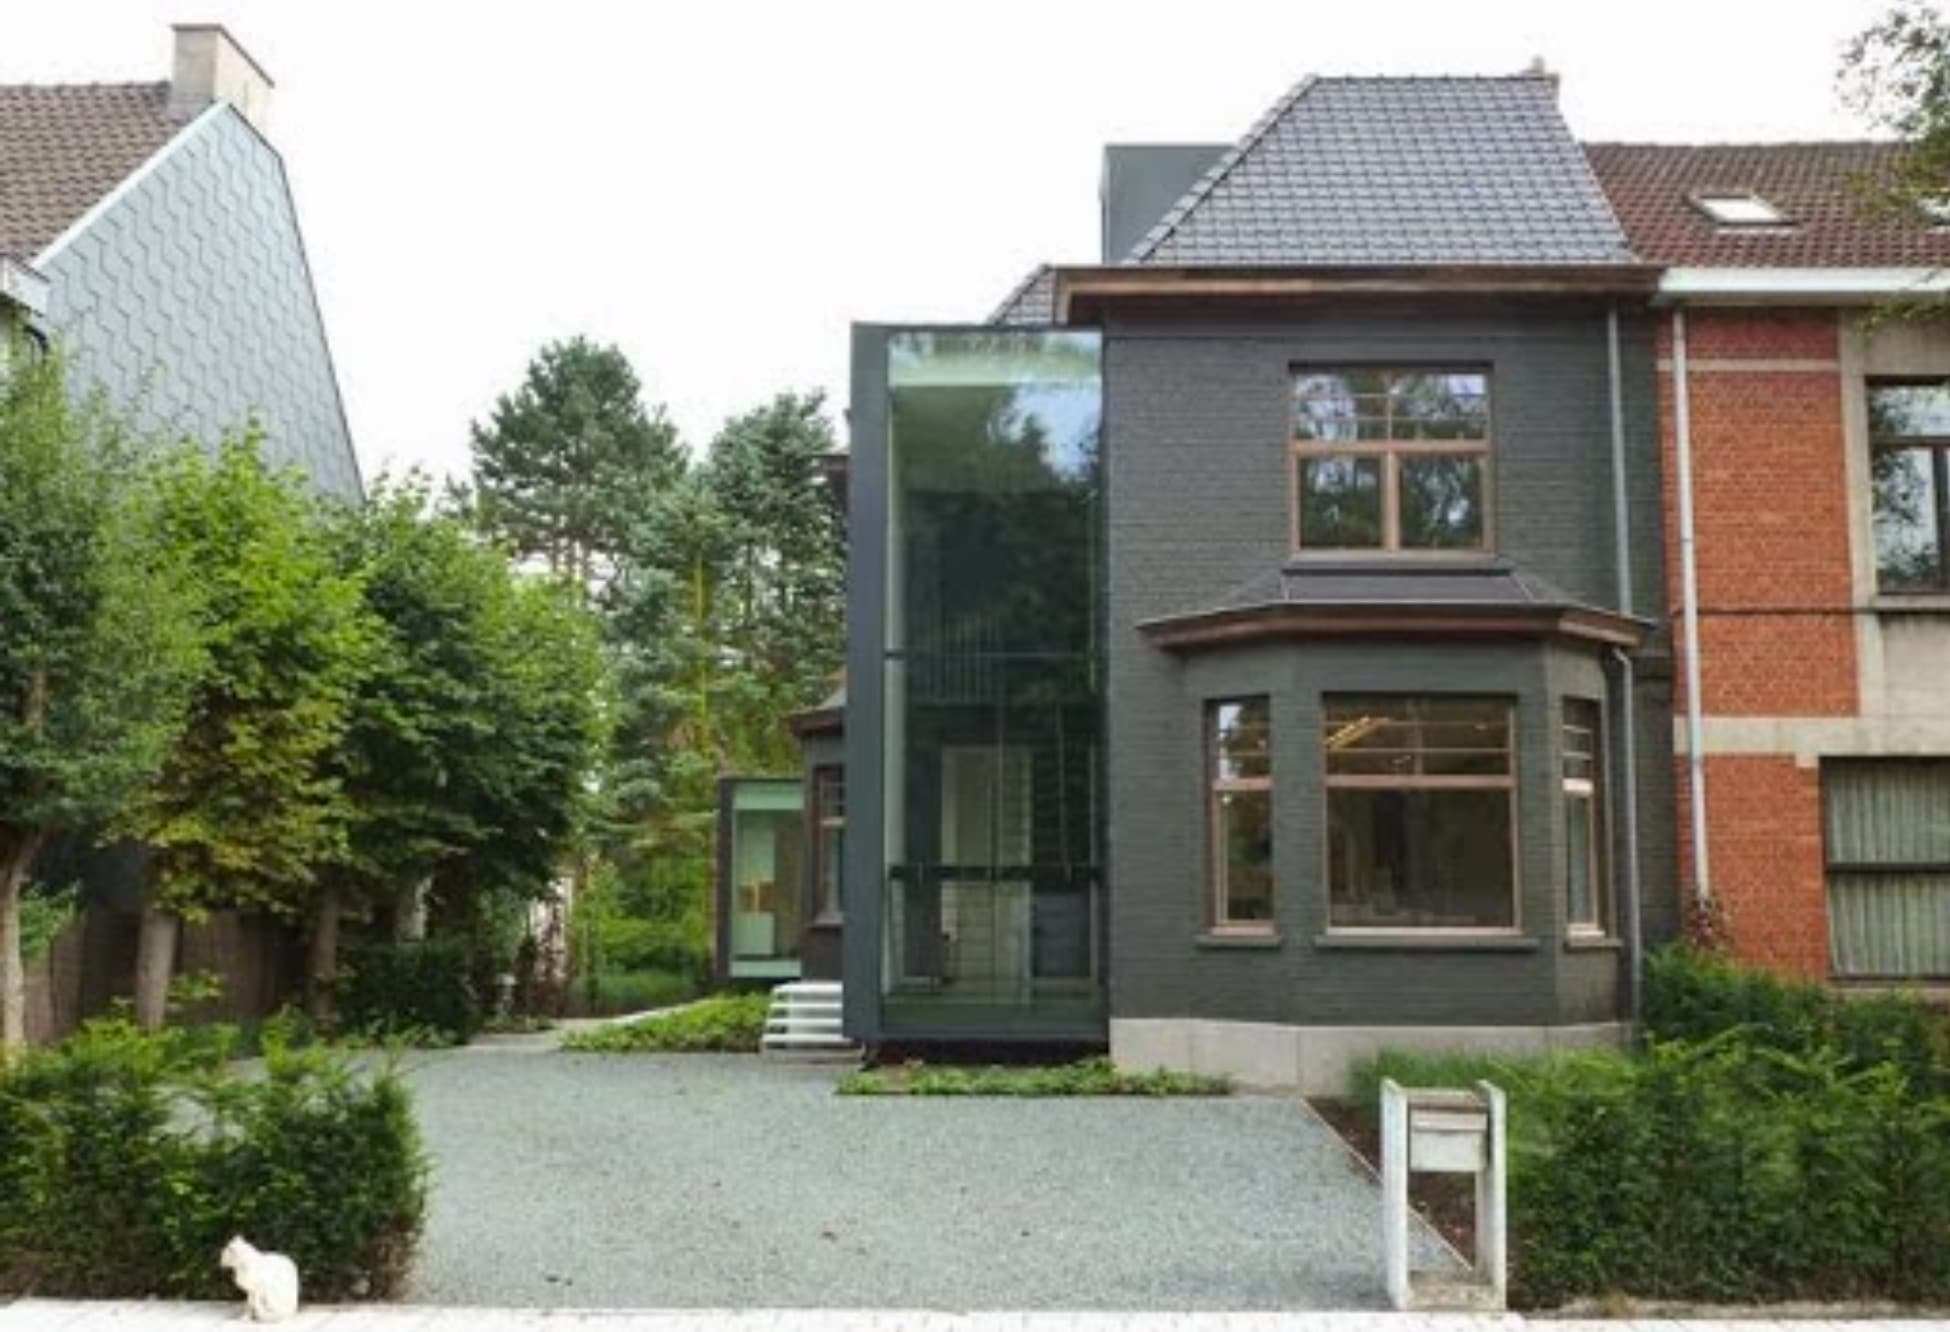 bureau | Baeyens & Beck architecten Gent | architect nieuwbouw renovatie interieur | high end | architectenbureau